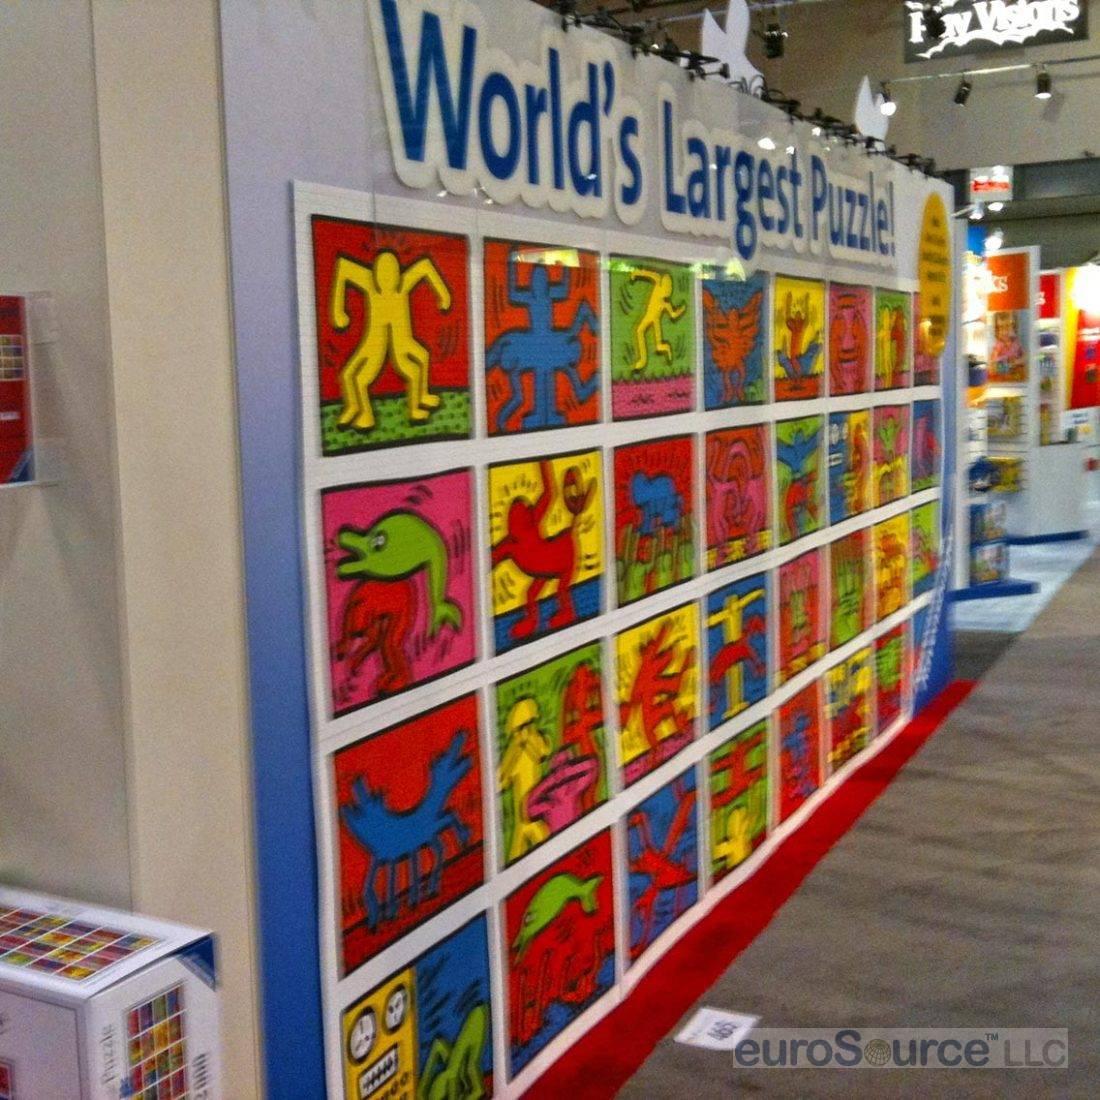 Ravensburger Worlds Largest Puzzle